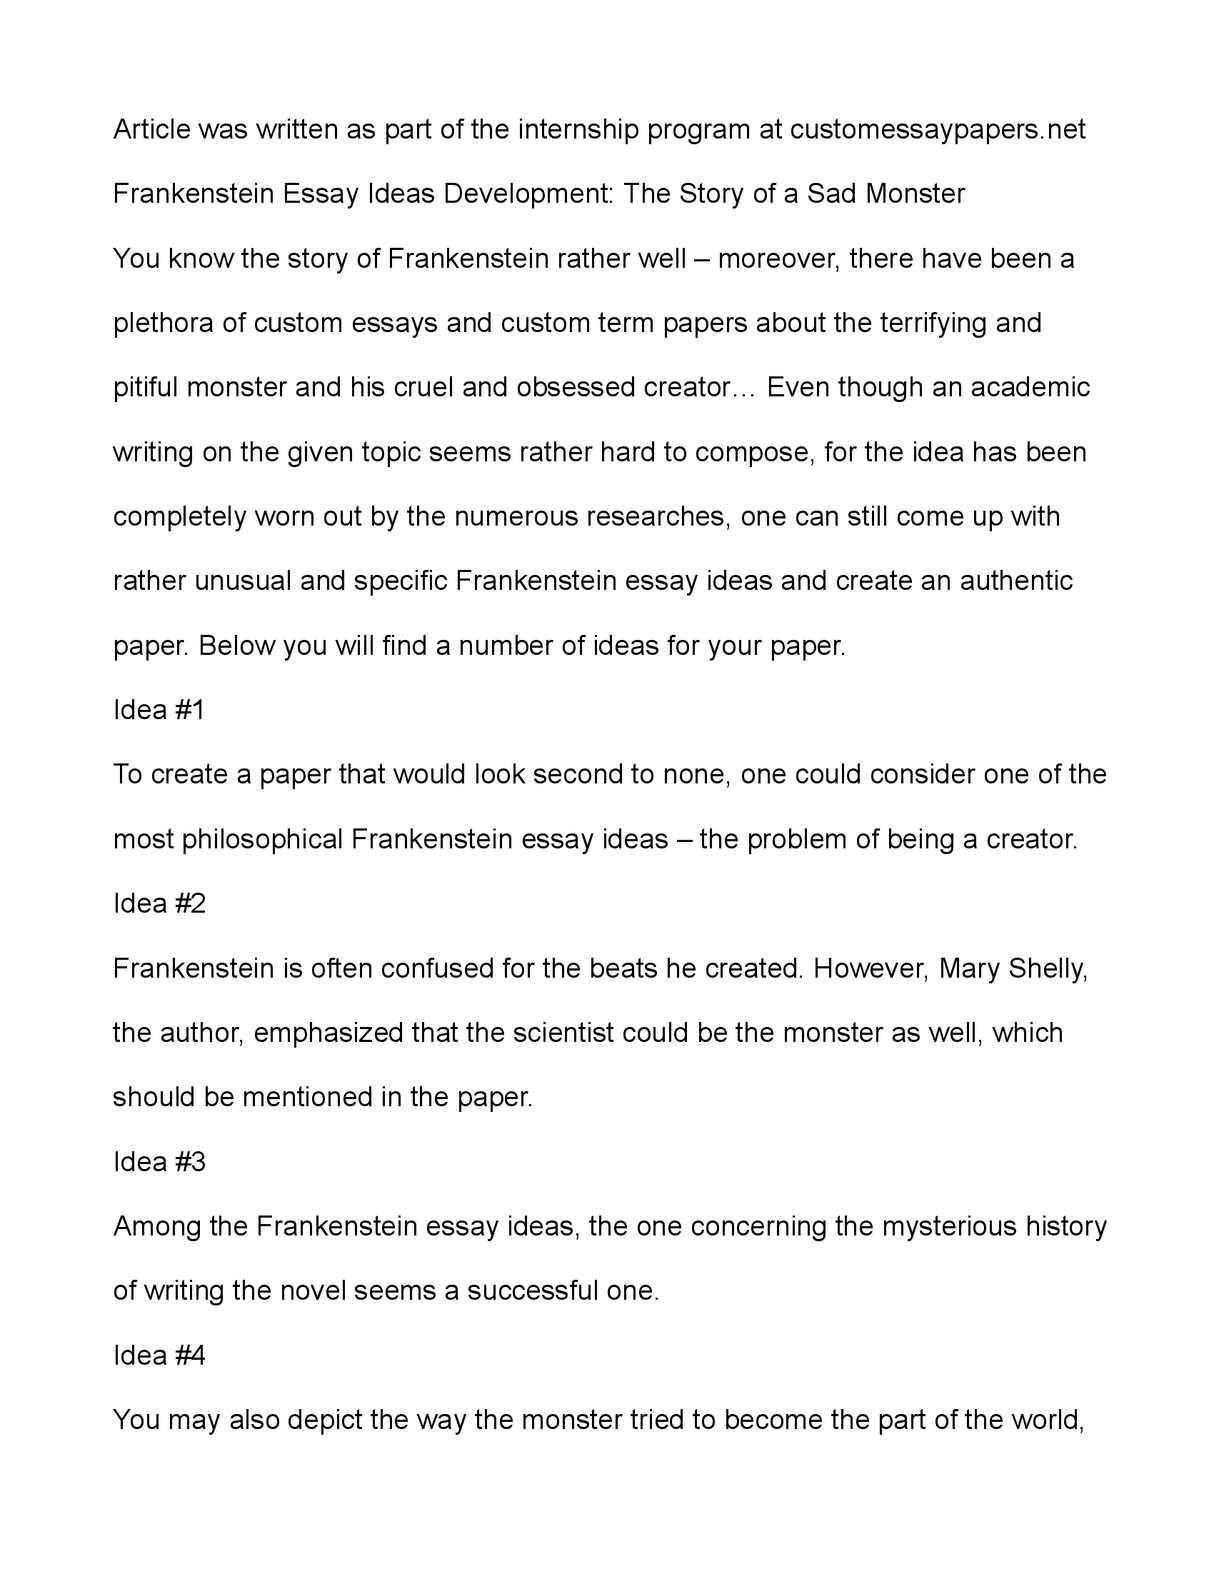 003 Frankenstein Essay Example Breathtaking Prompts Argumentative Topics Full